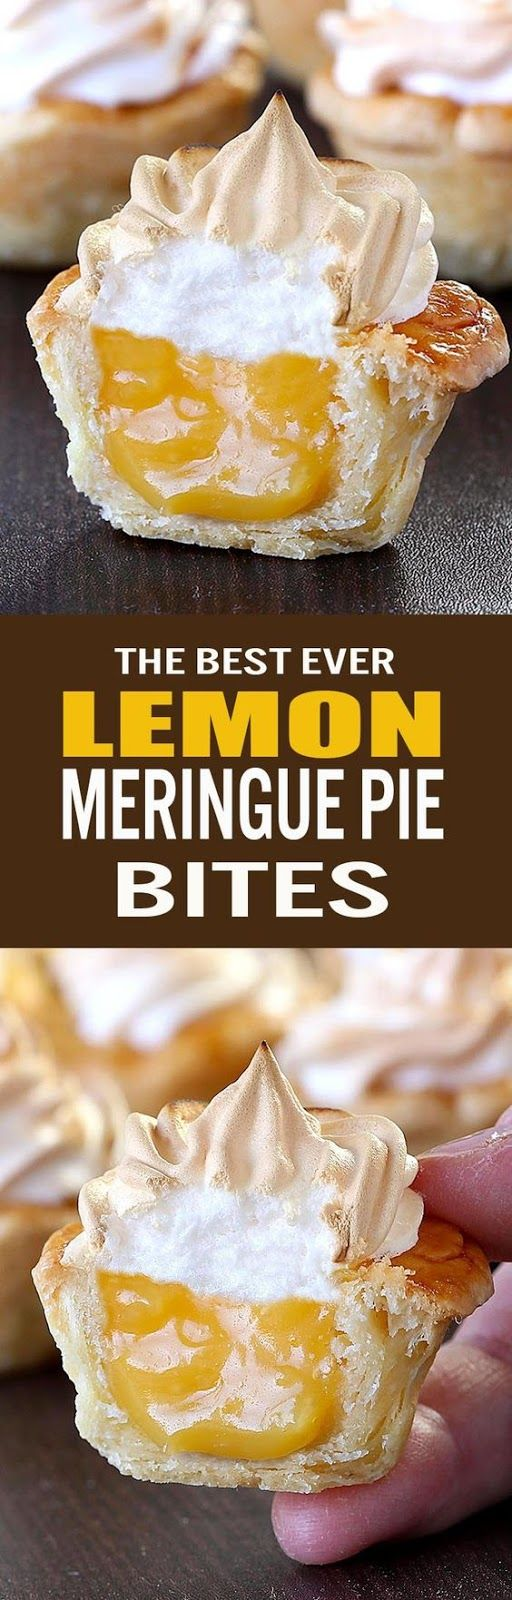 Lemon Meringue Pie Bites | Food And Cake Recipes